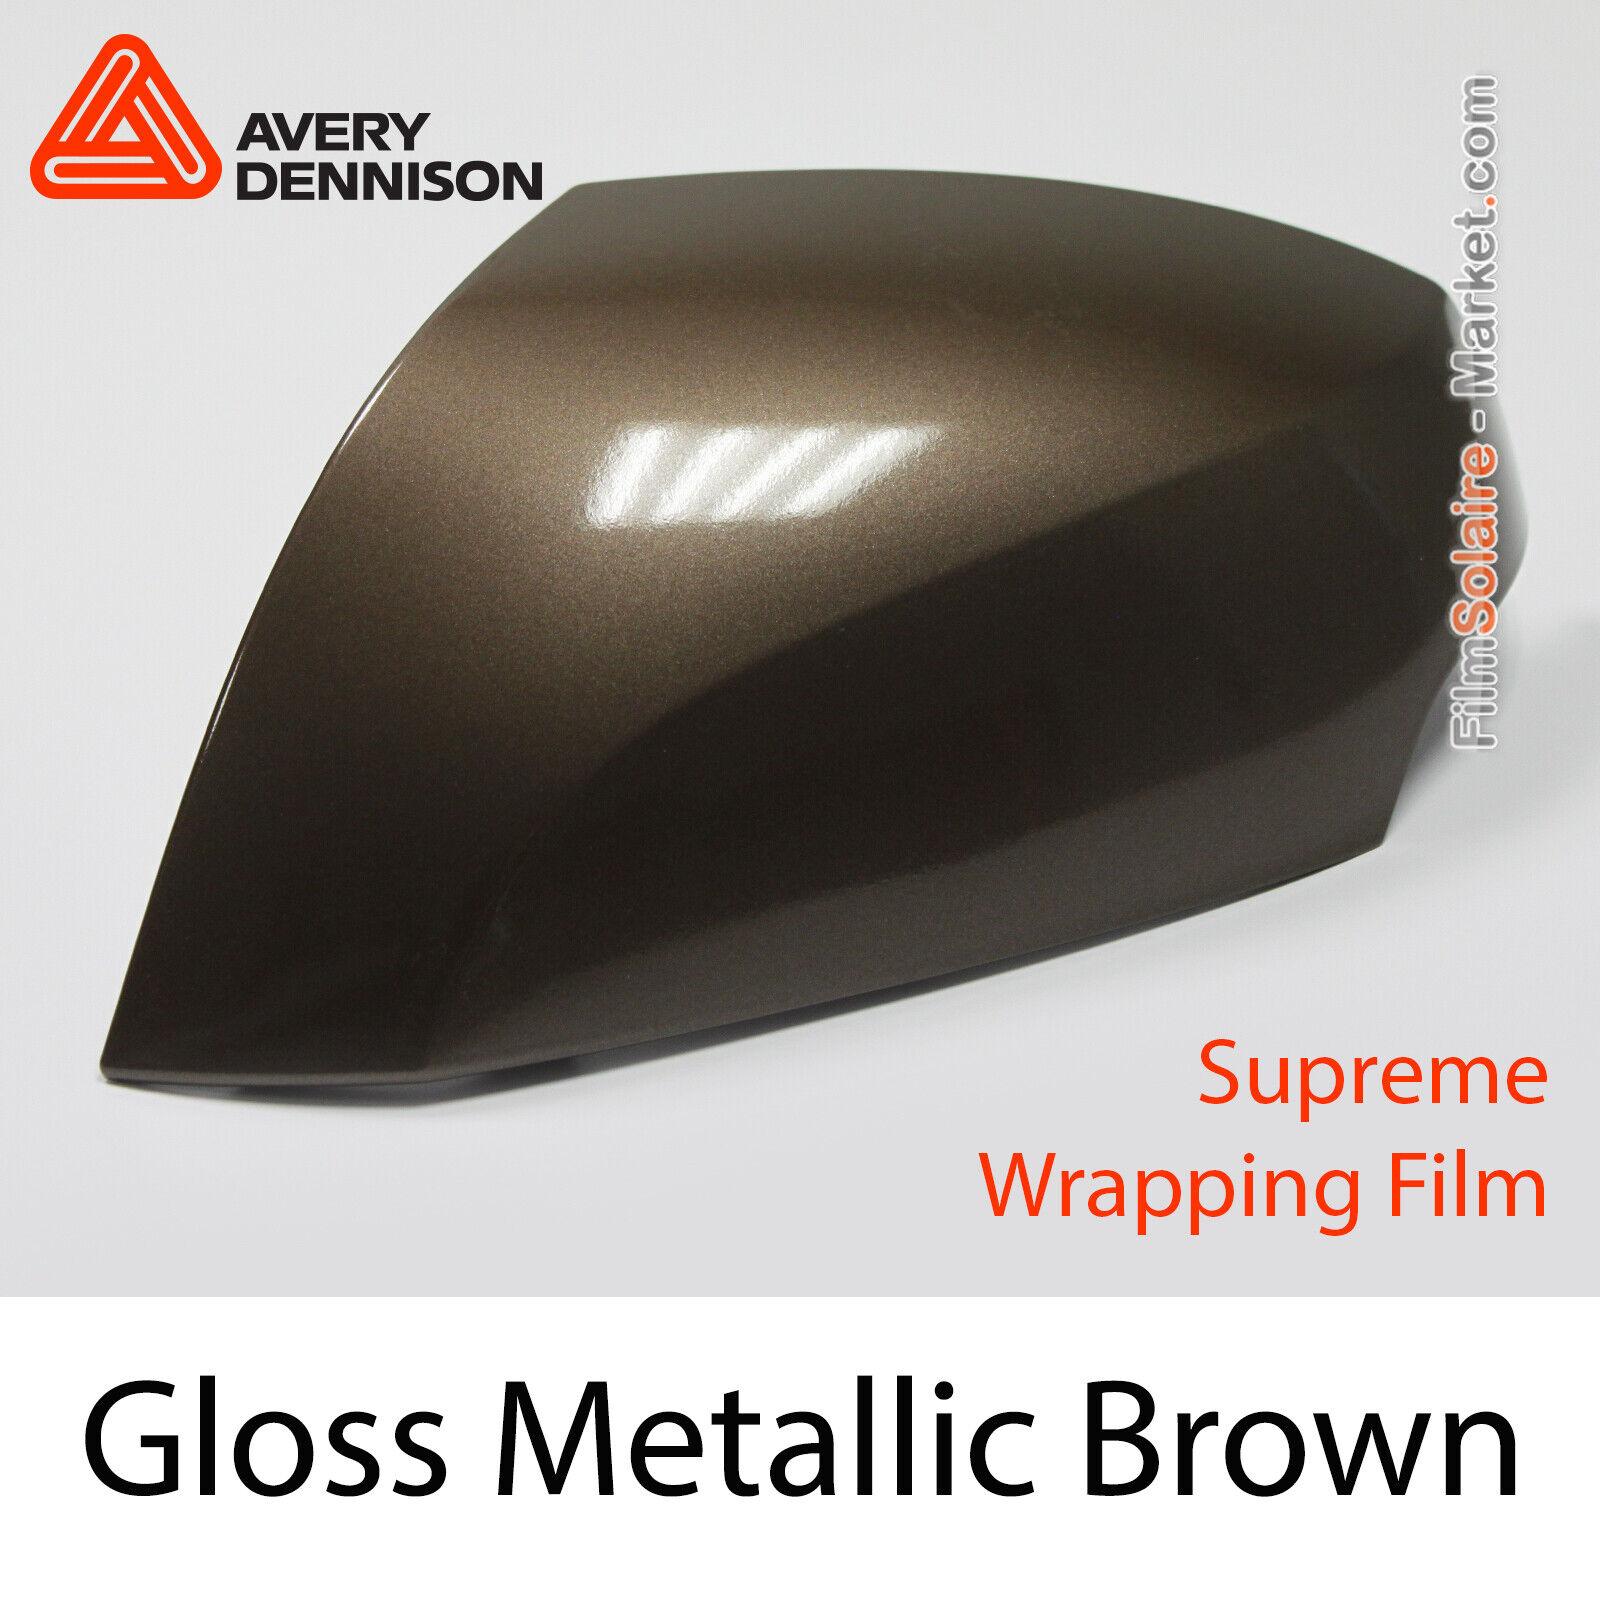 Gloss Metallic braun - Avery Dennison Supreme Wrapping Folie,Abdeckung Cb1630001